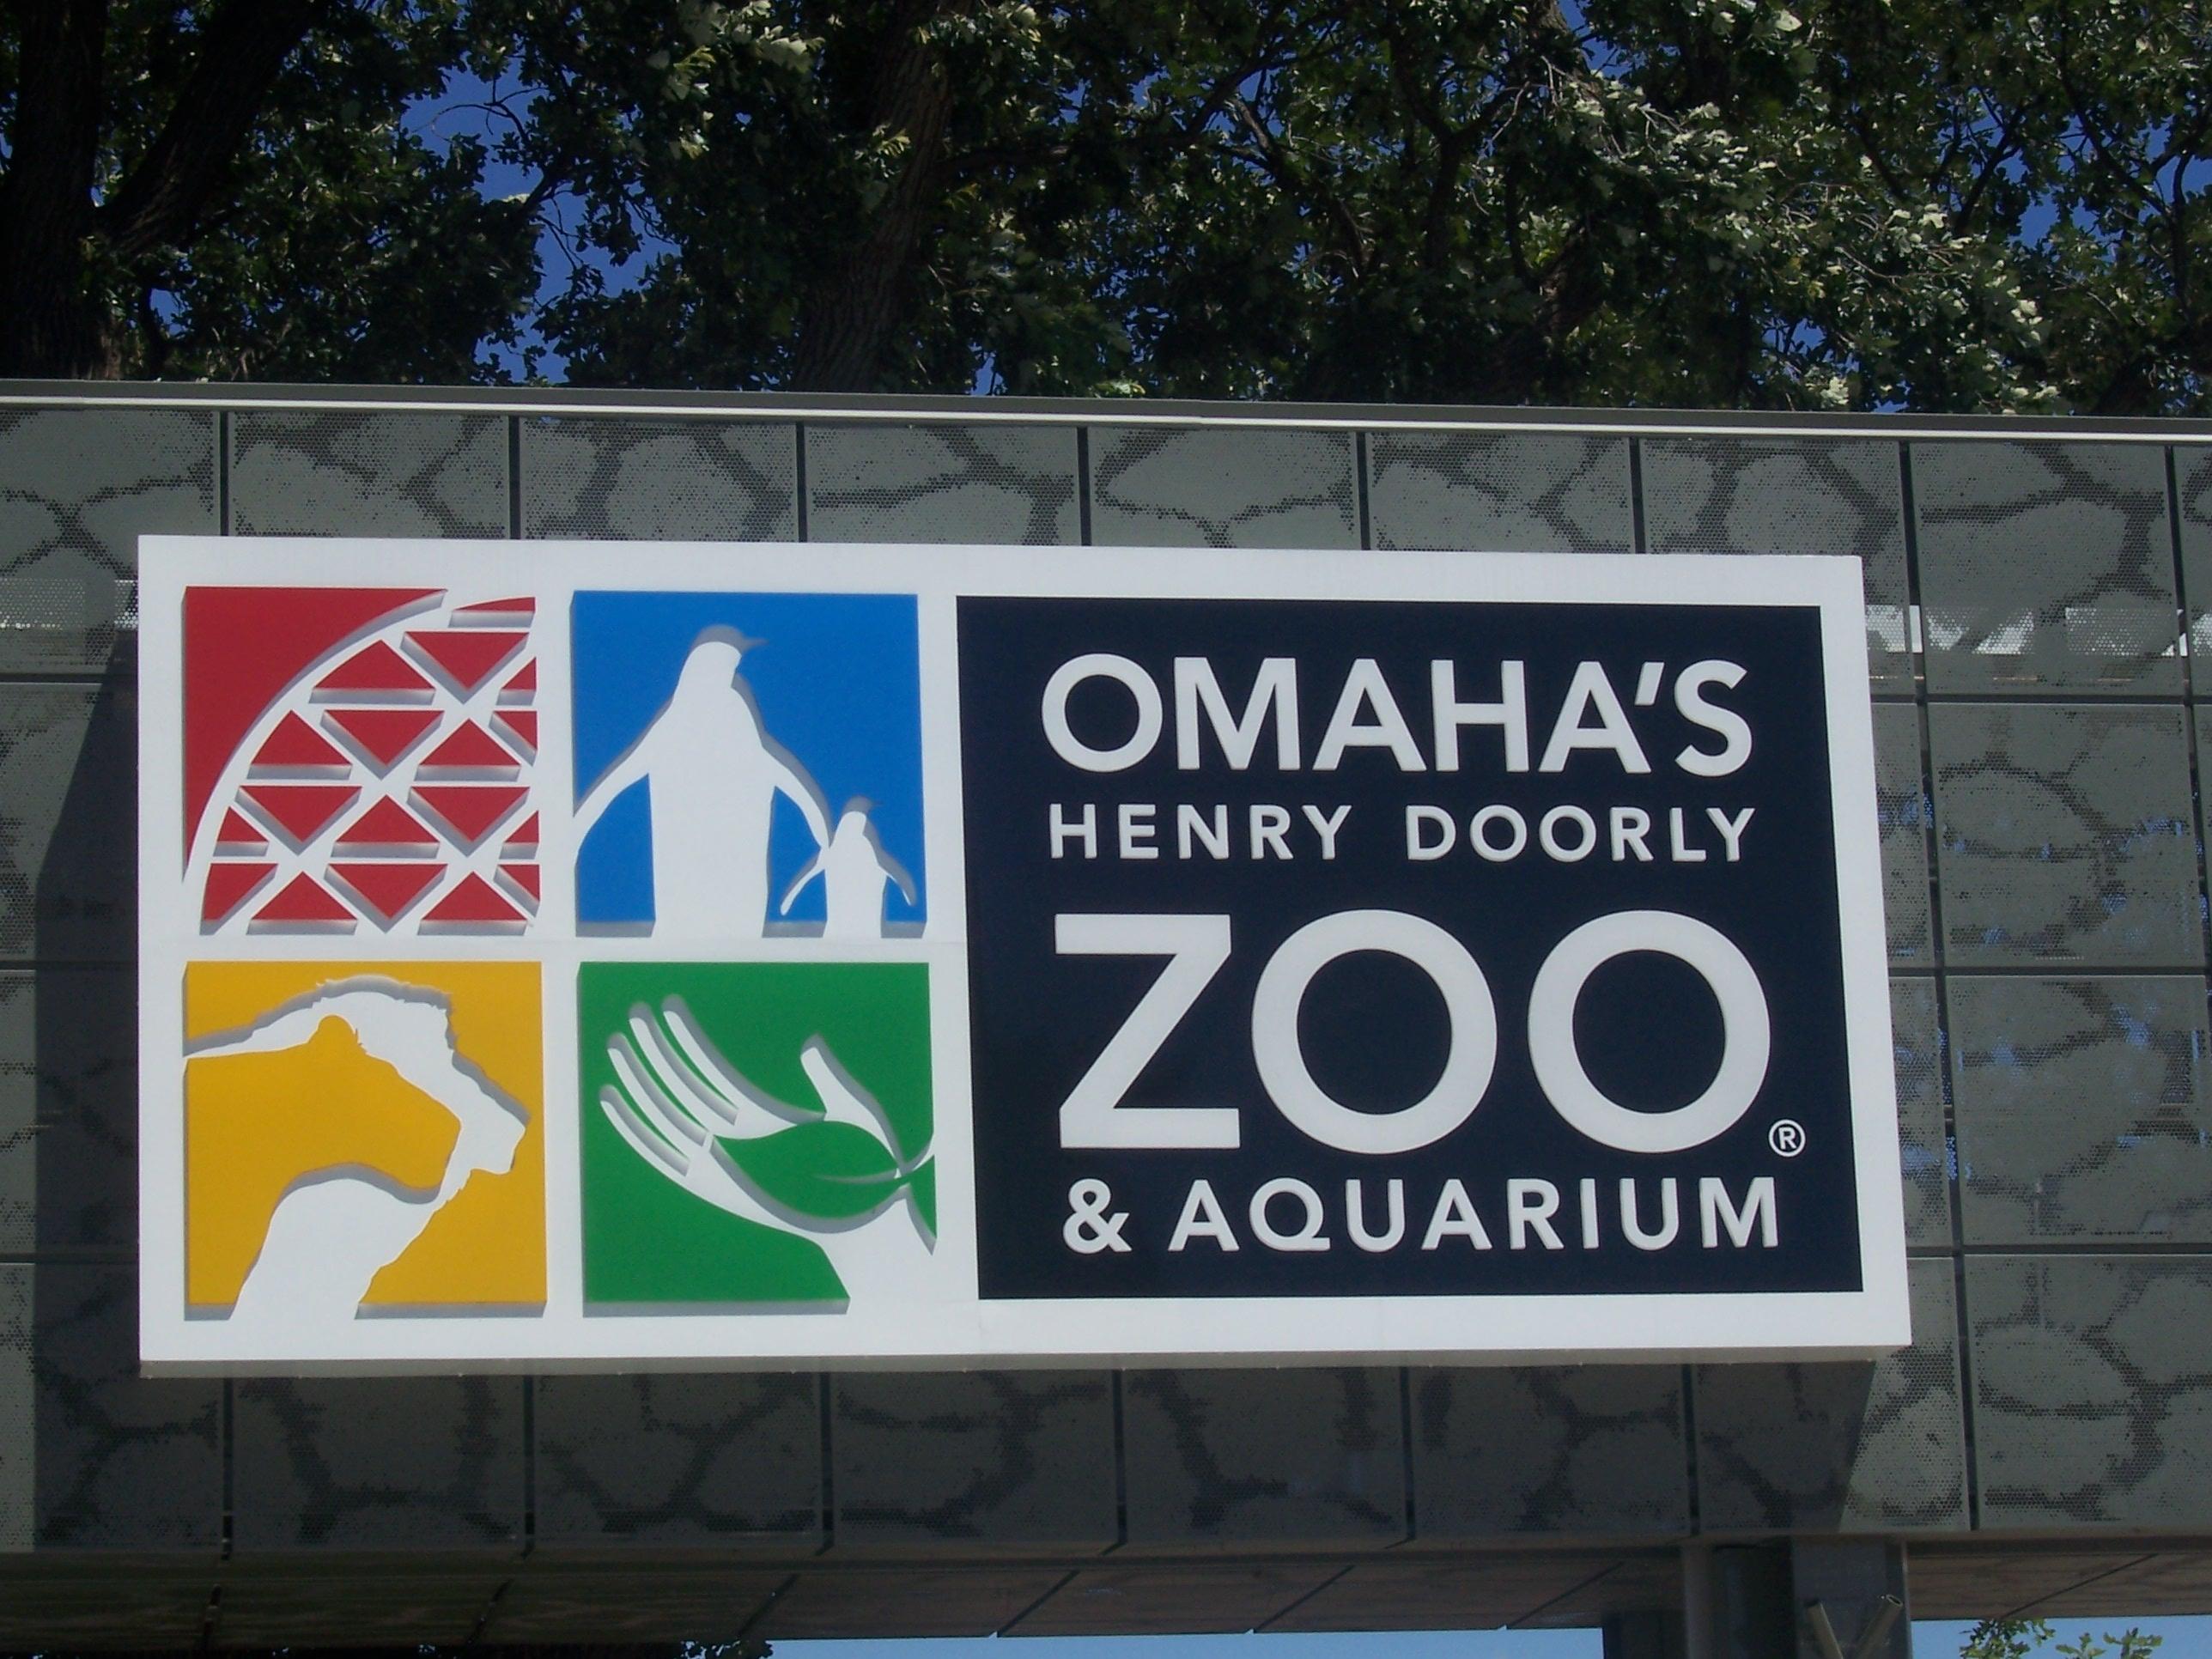 Henry Doorly Zoo and Aquarium, Omaha, Nebraska - Wild ...